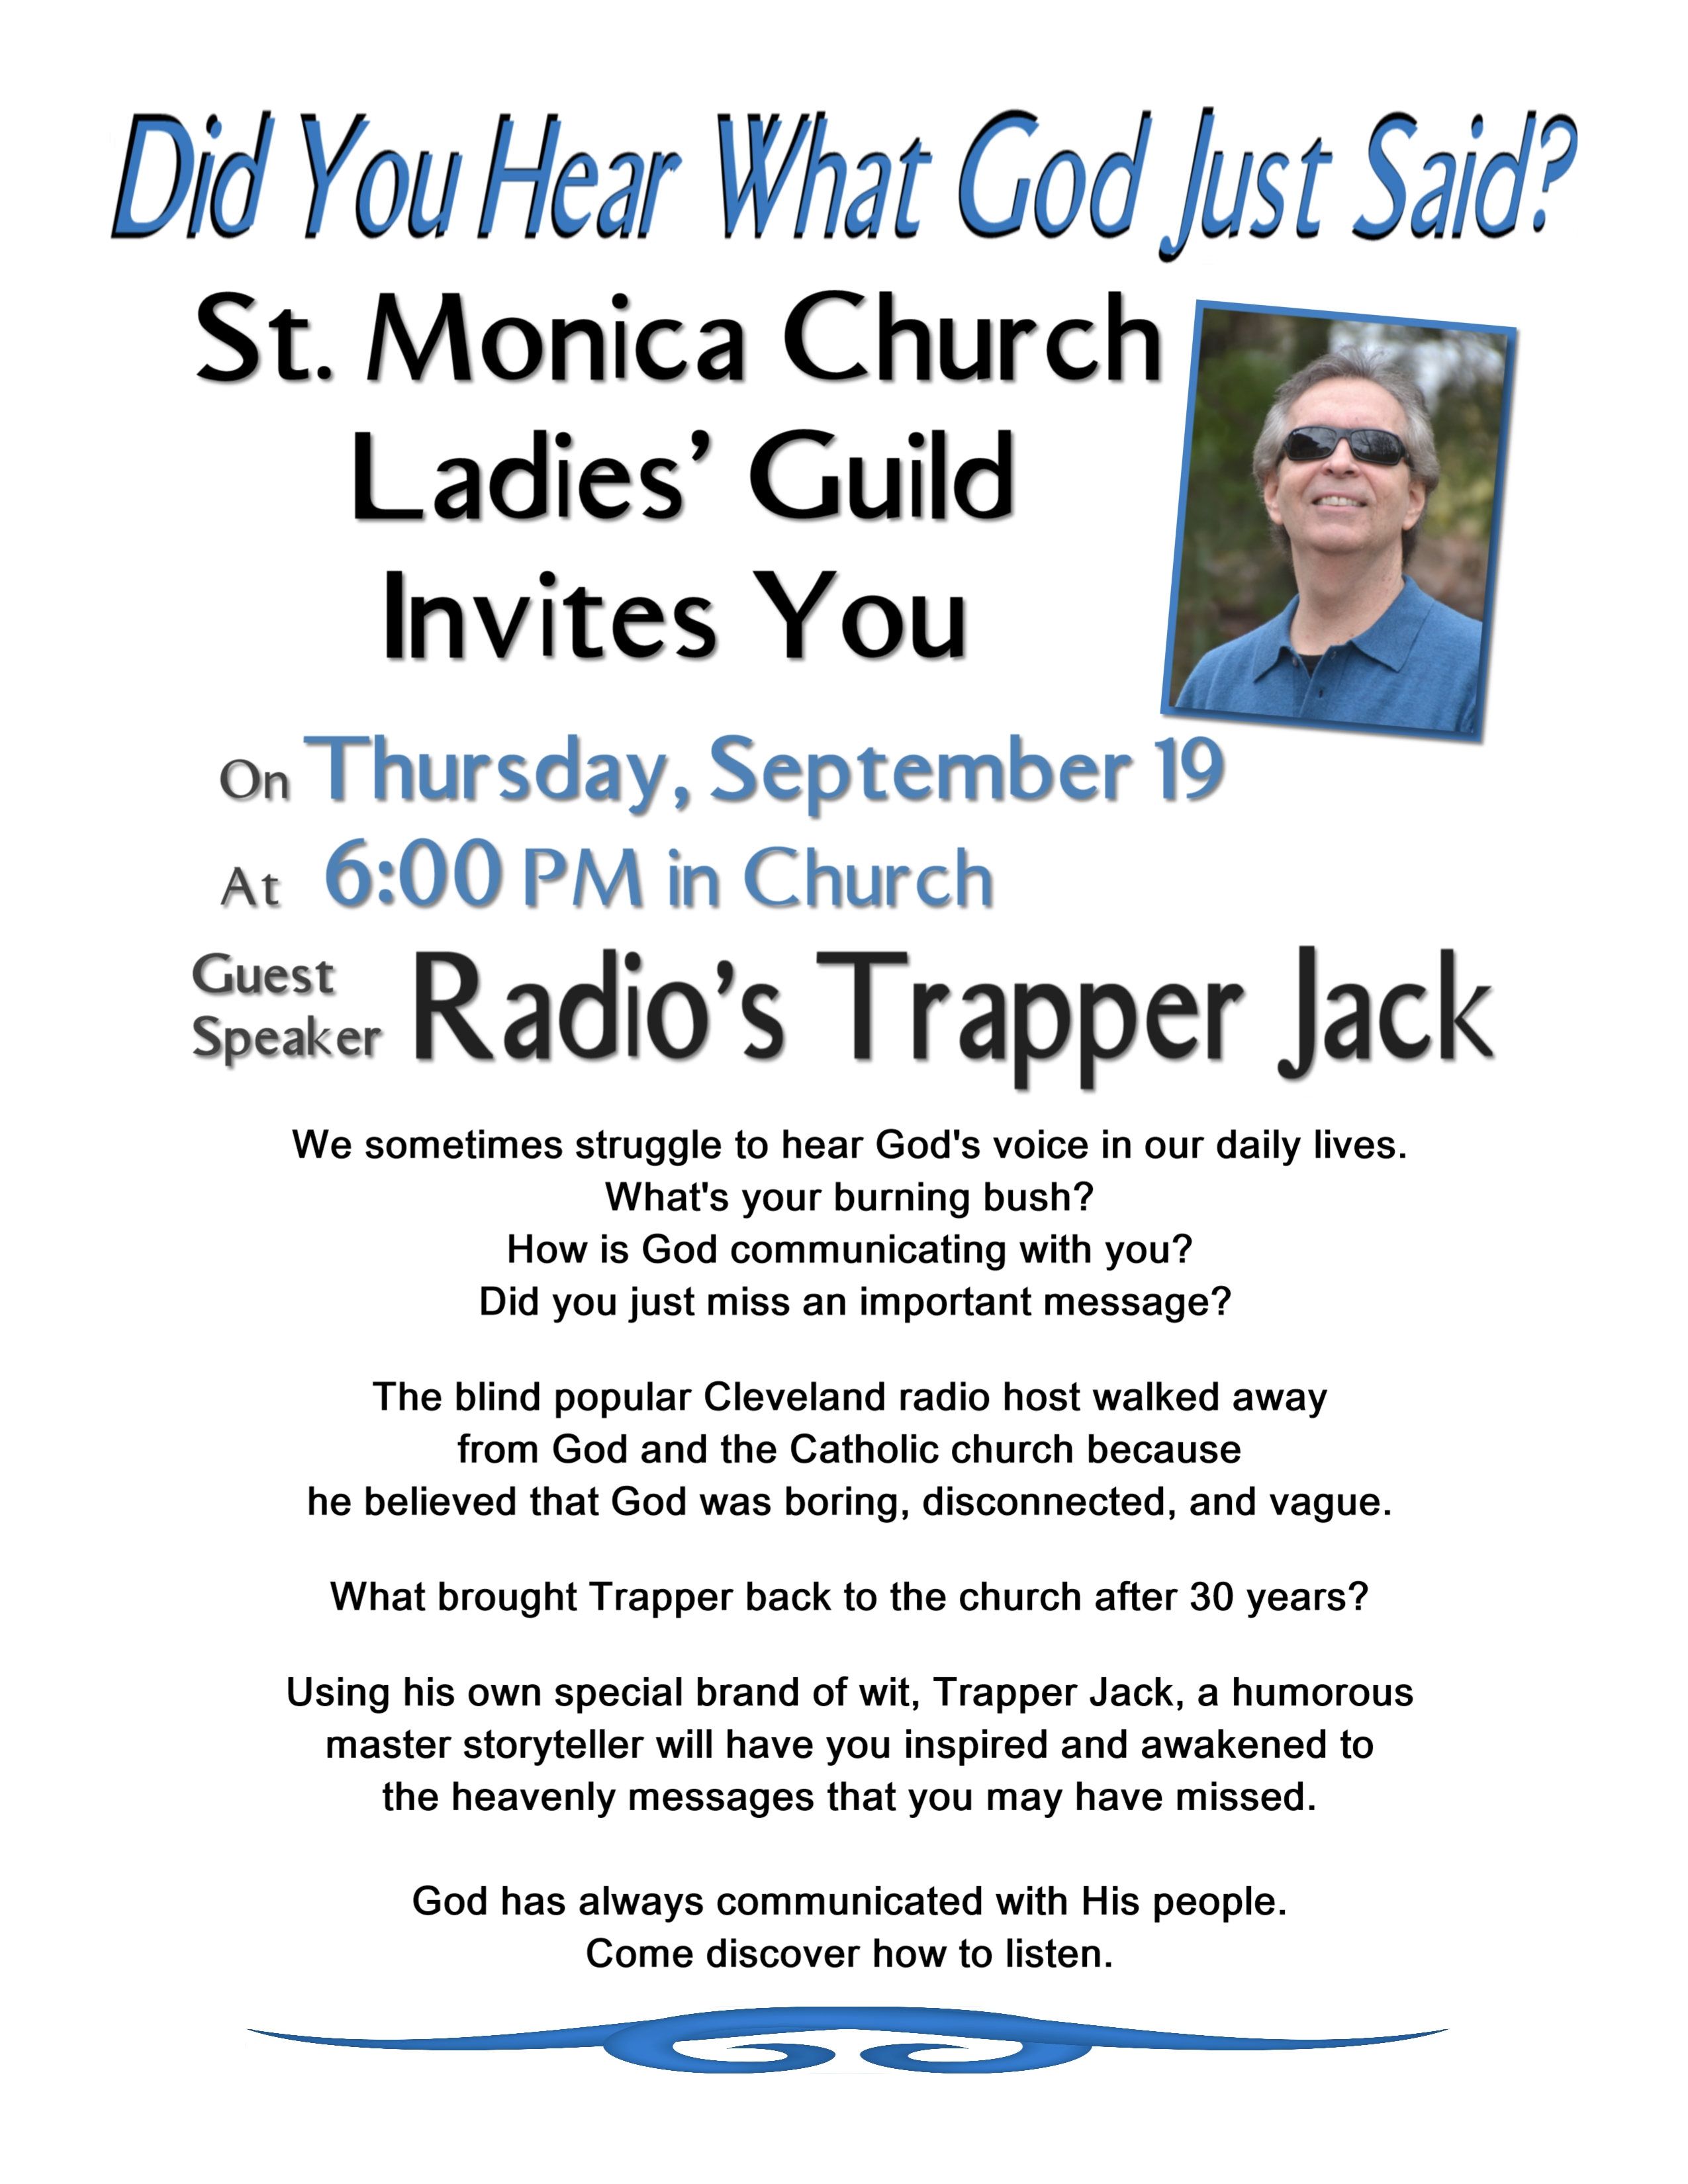 St Monica Church Ladies Guild